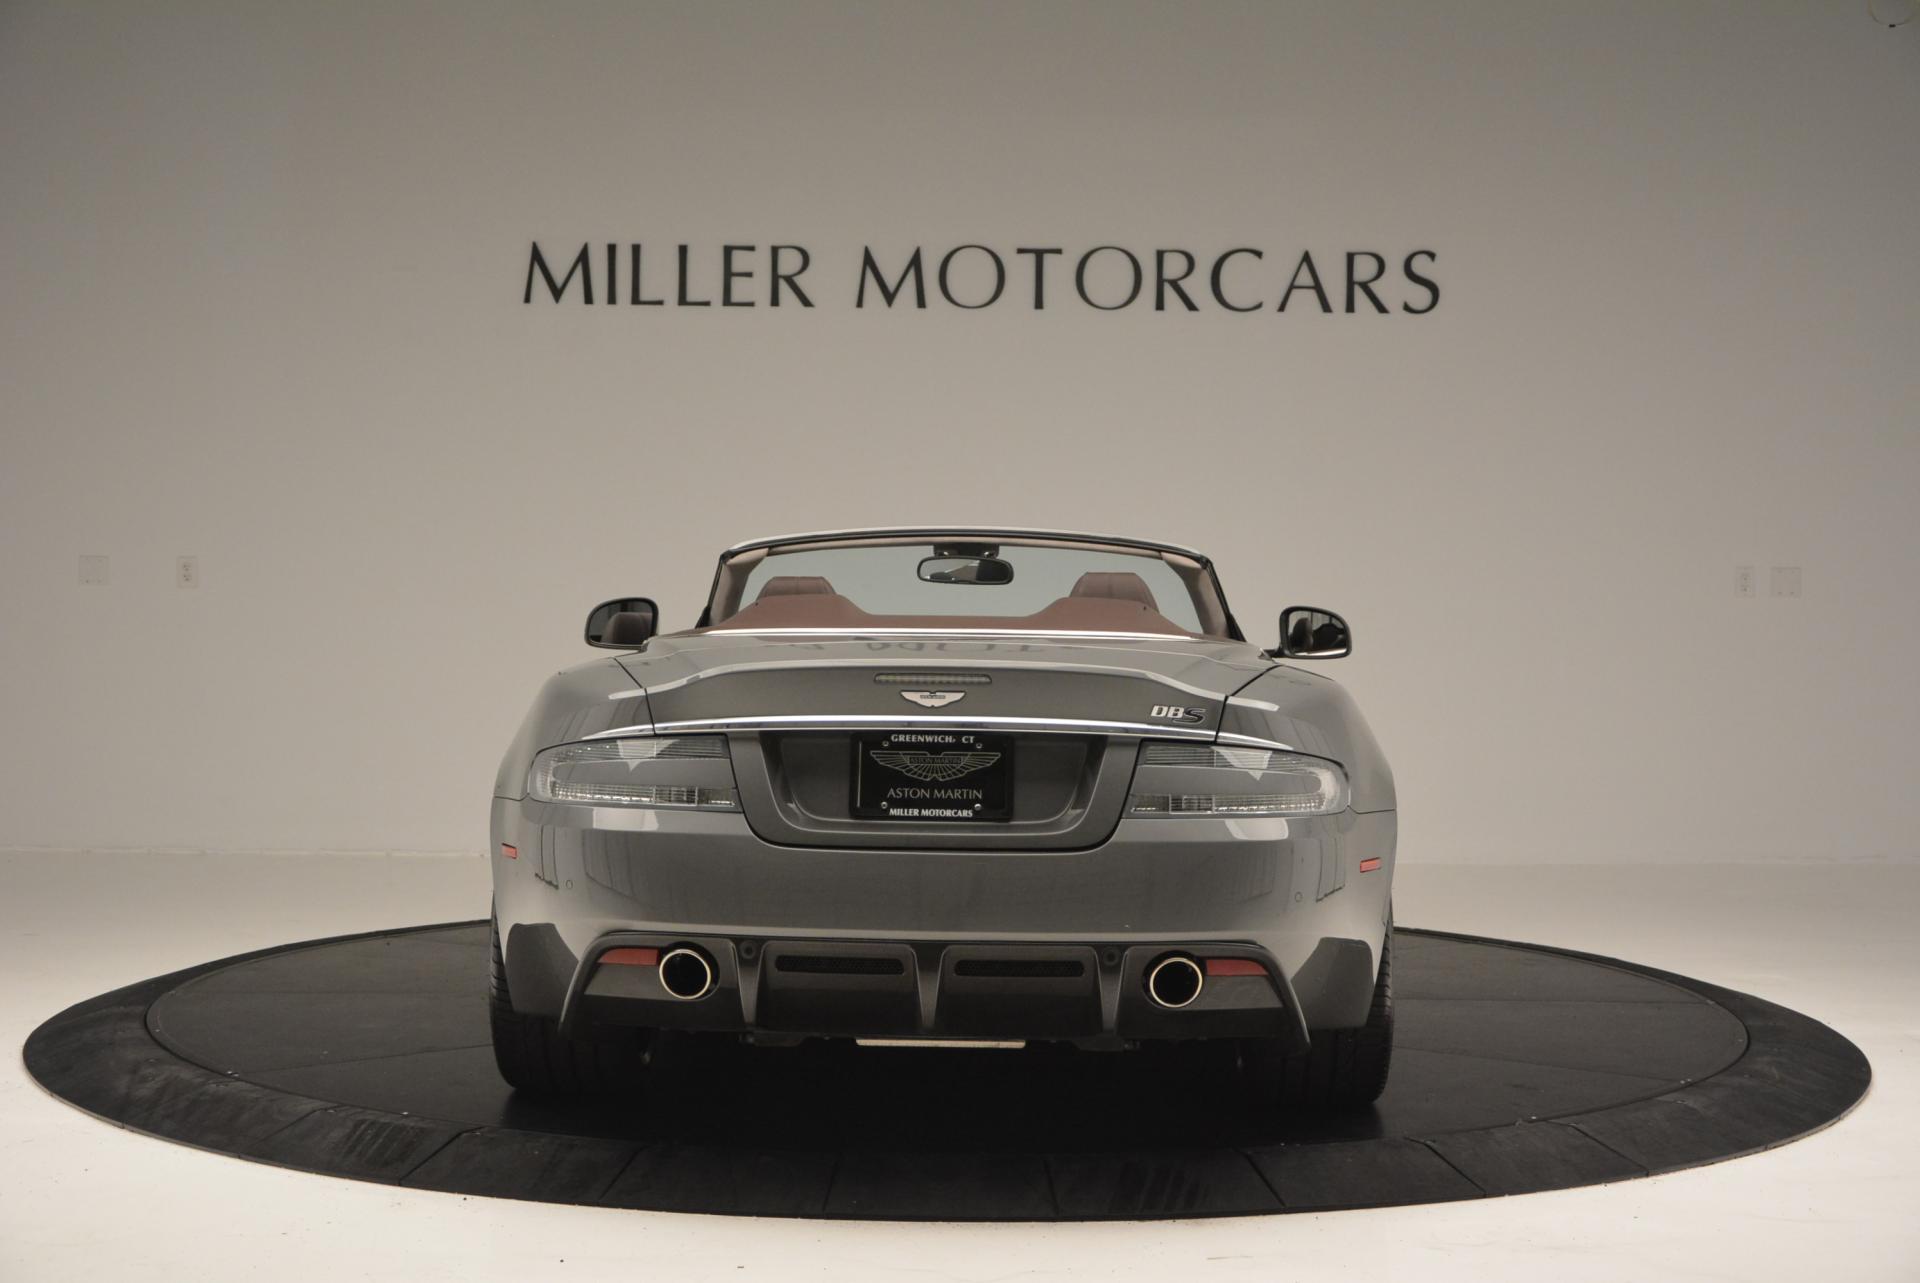 Used 2010 Aston Martin DBS Volante For Sale In Greenwich, CT 87_p6